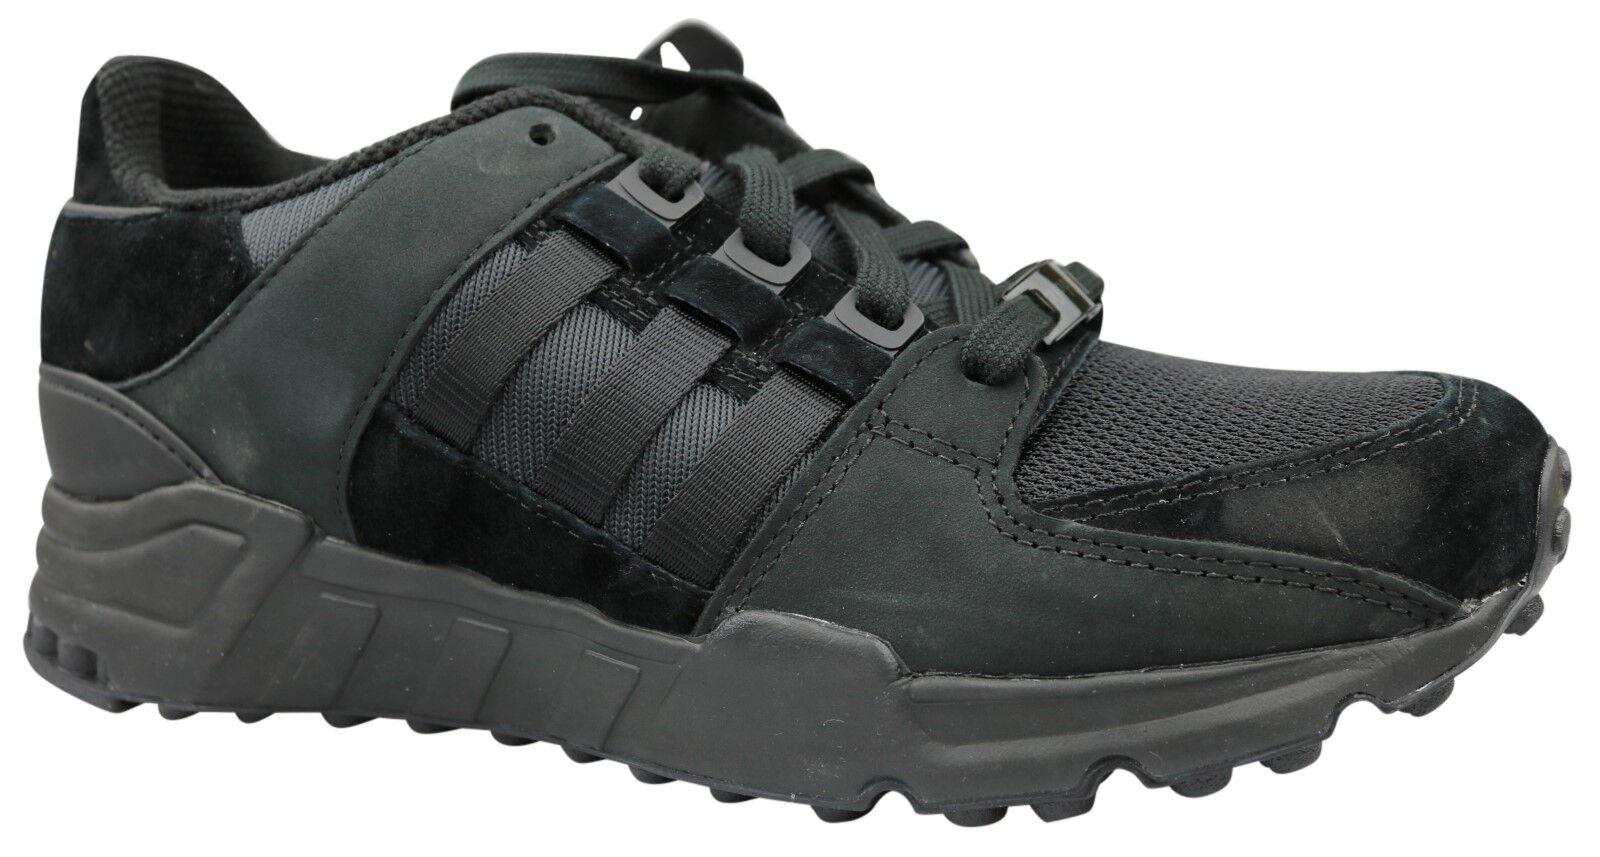 Adidas Originals EQT equipment running support support support zapatos s32149 talla 36 - 43 nuevo embalaje original  selección larga